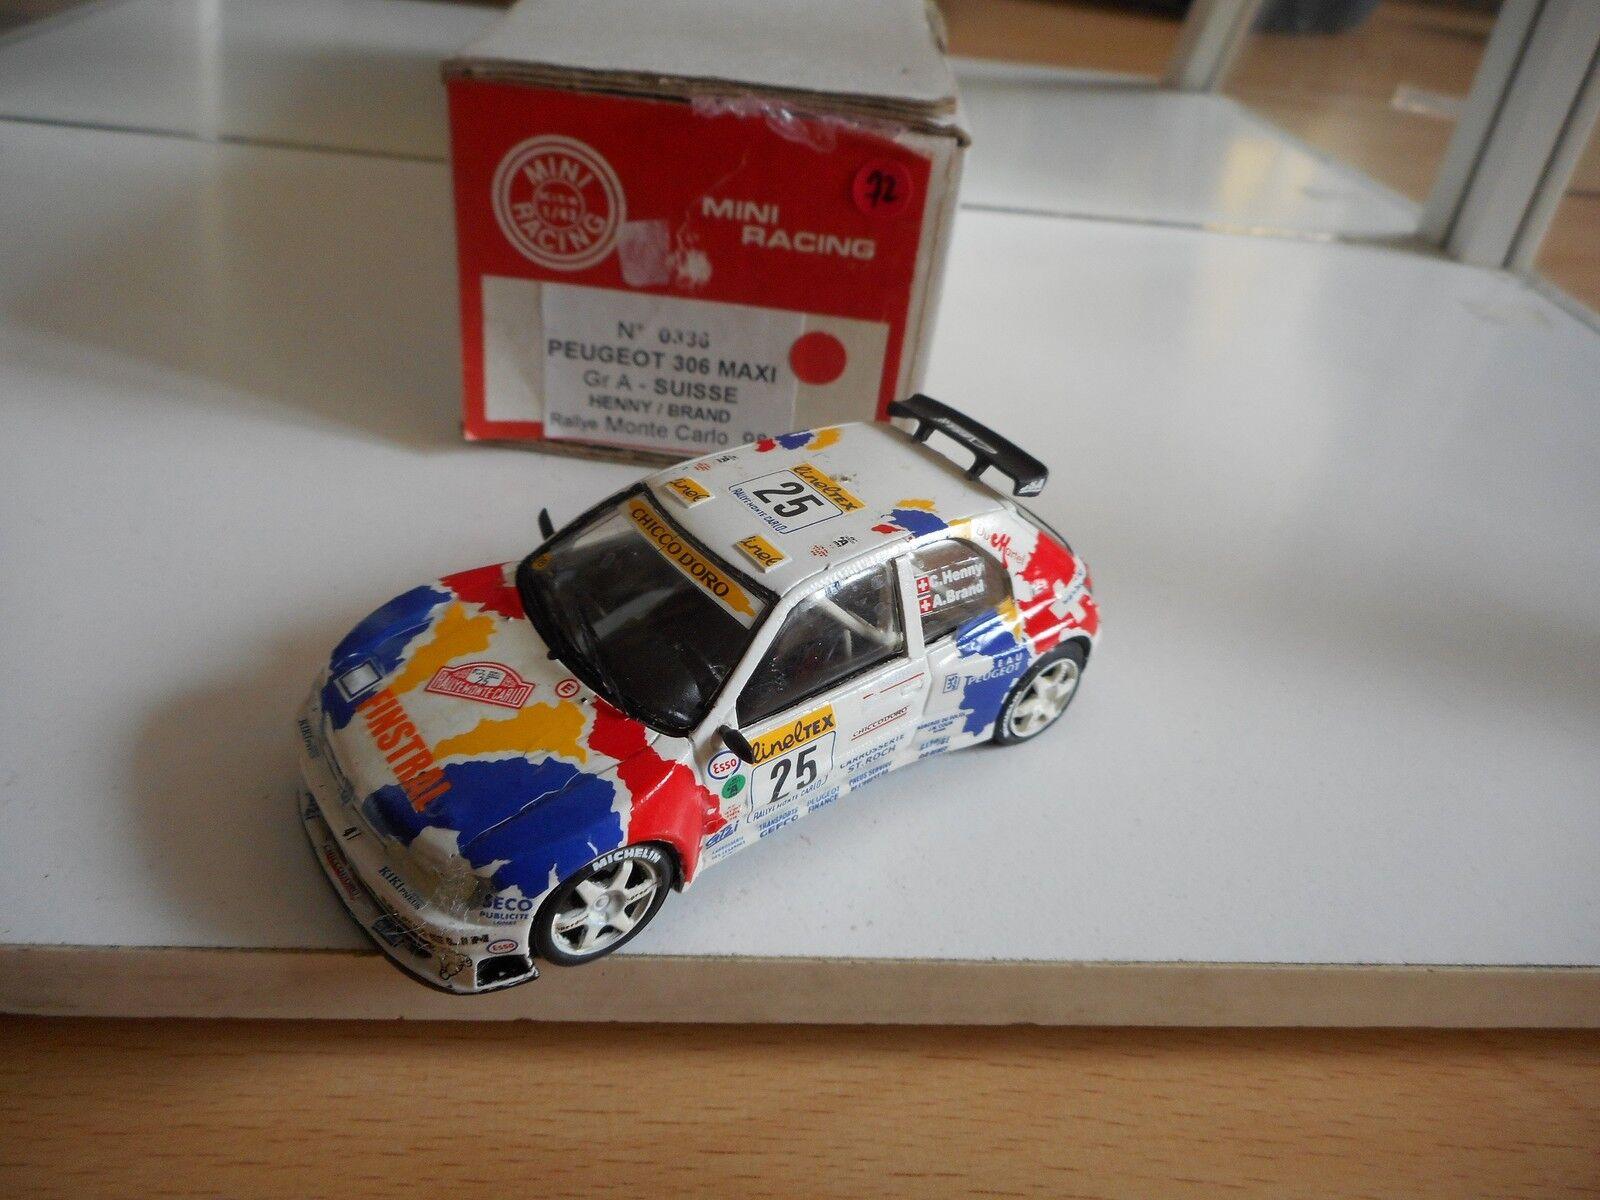 Mini Racing Peugeot 306 Maxi GR A. Rally monte Carlo 98 in blanc on 1 43 in Box